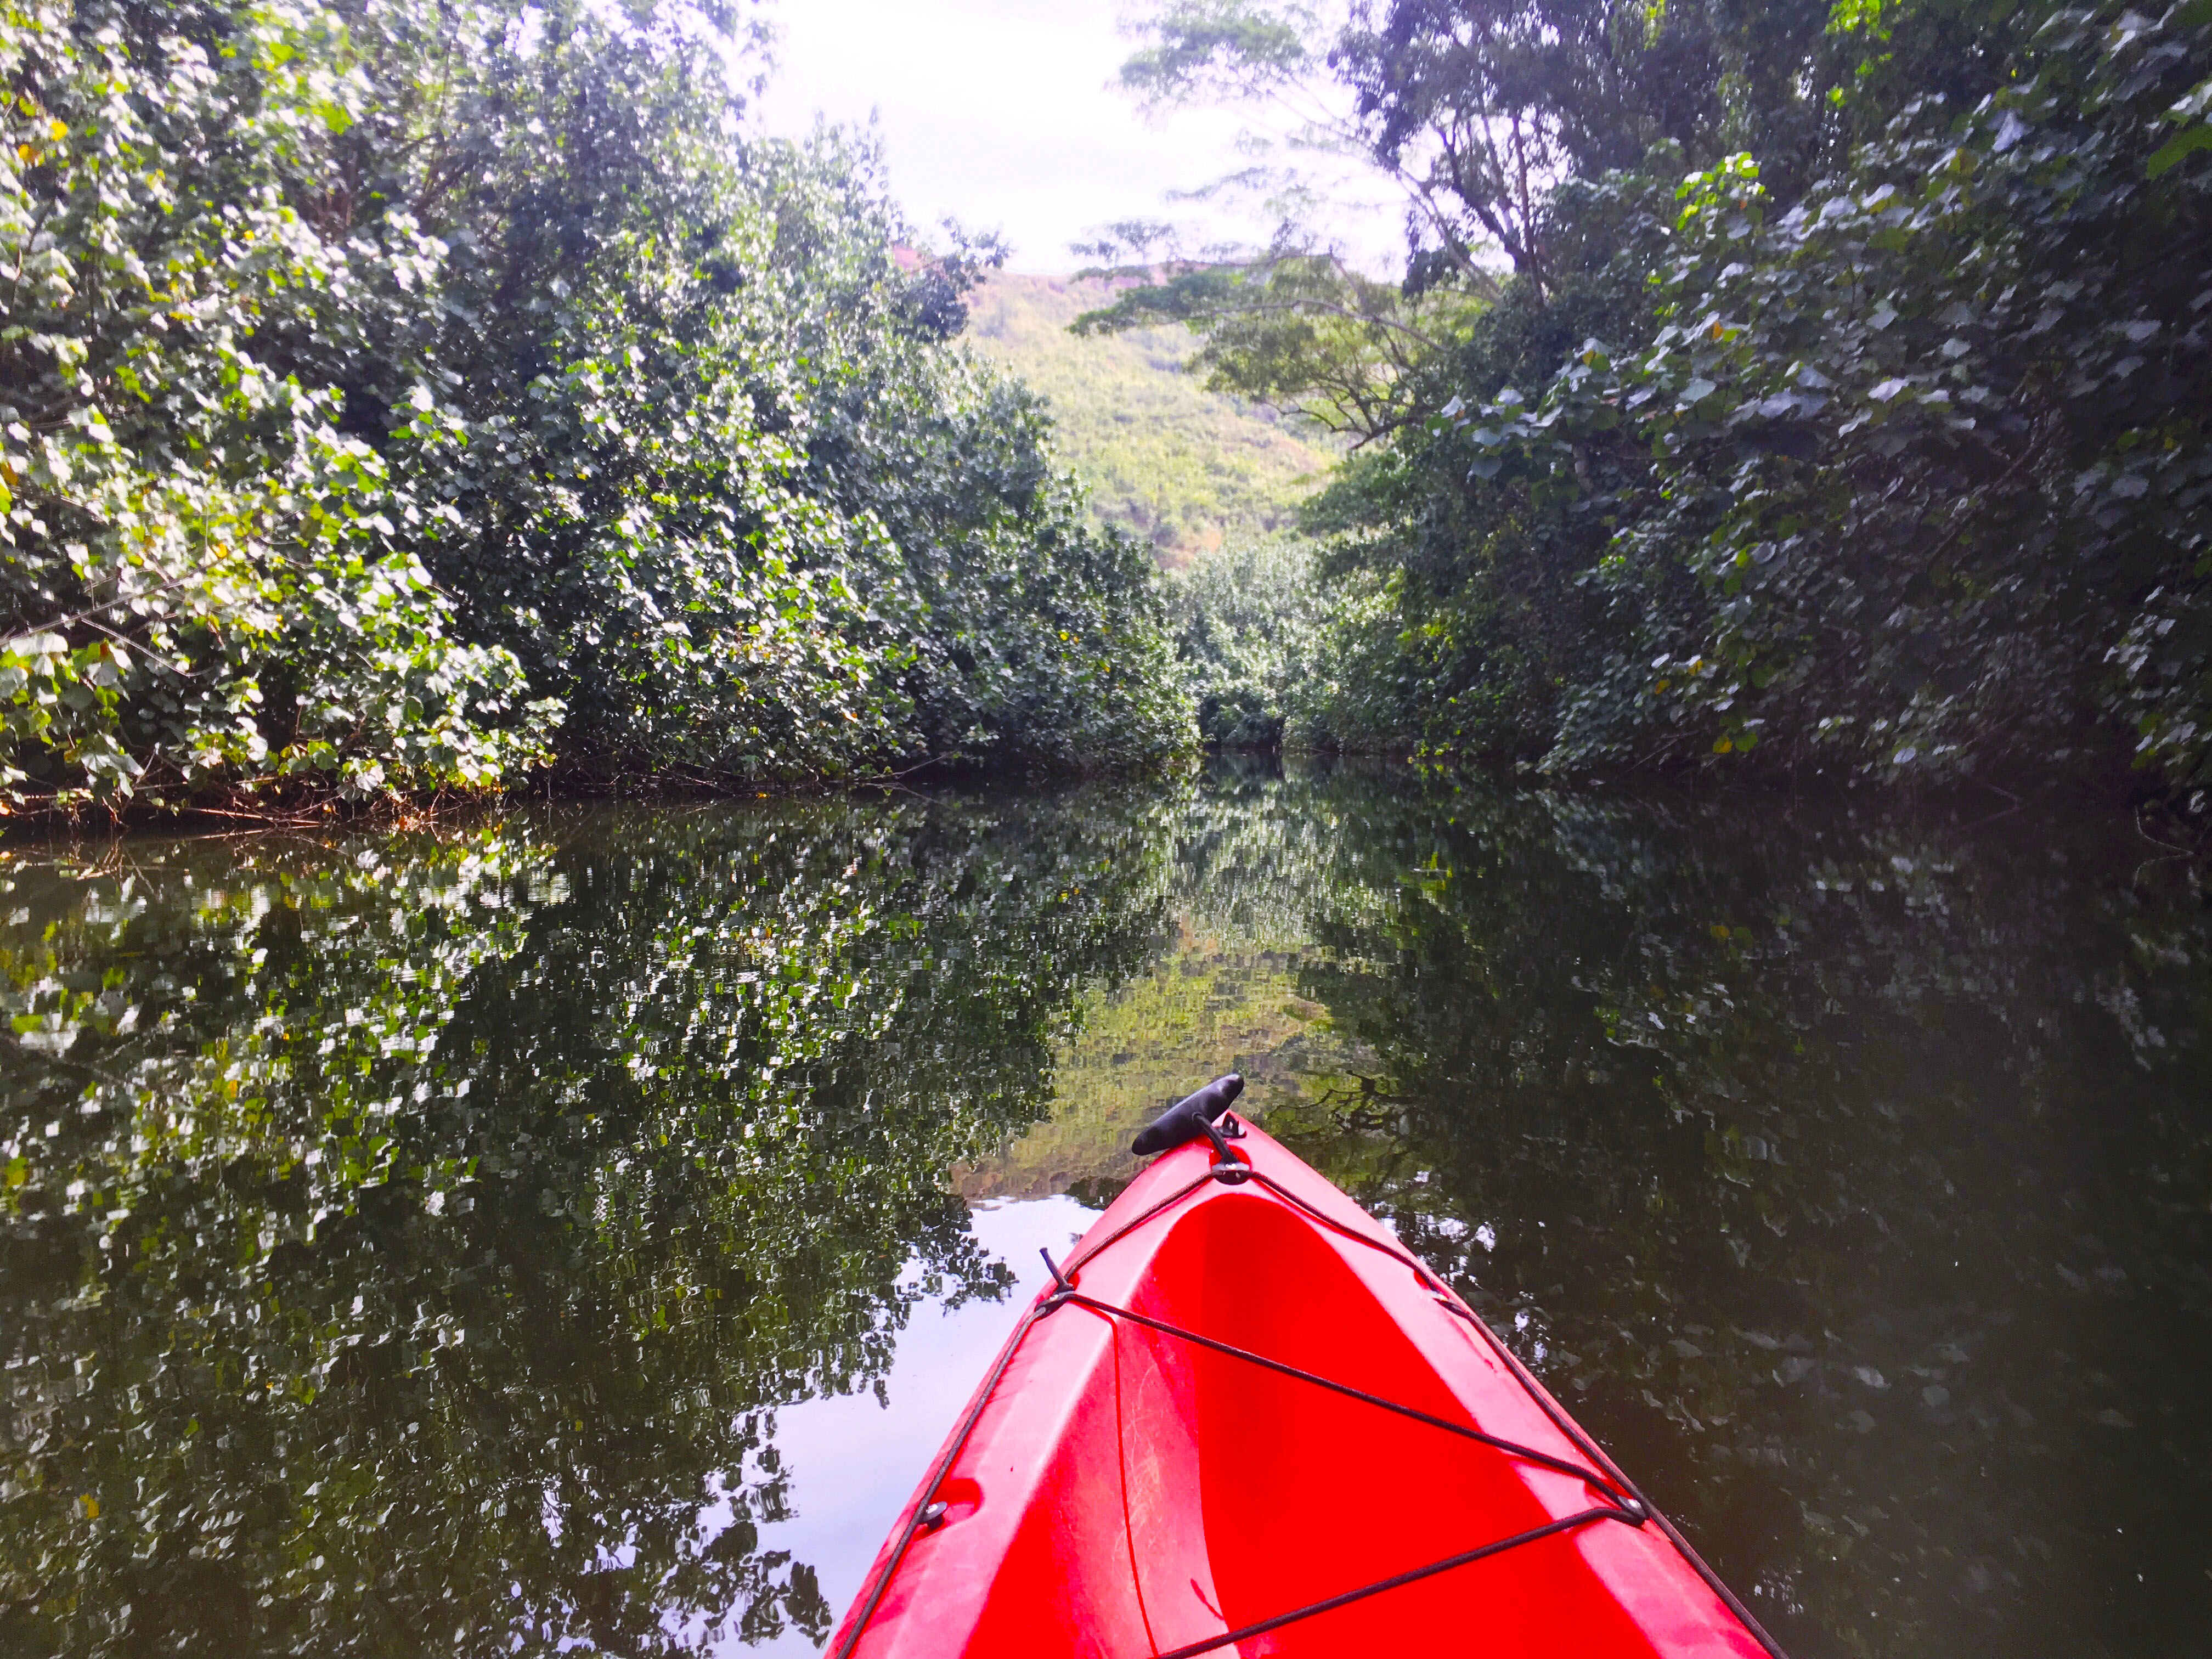 @eatwellexploreoften's cover photo for 'Exploring Kauai by Kayak - Eat Well, Explore Often'